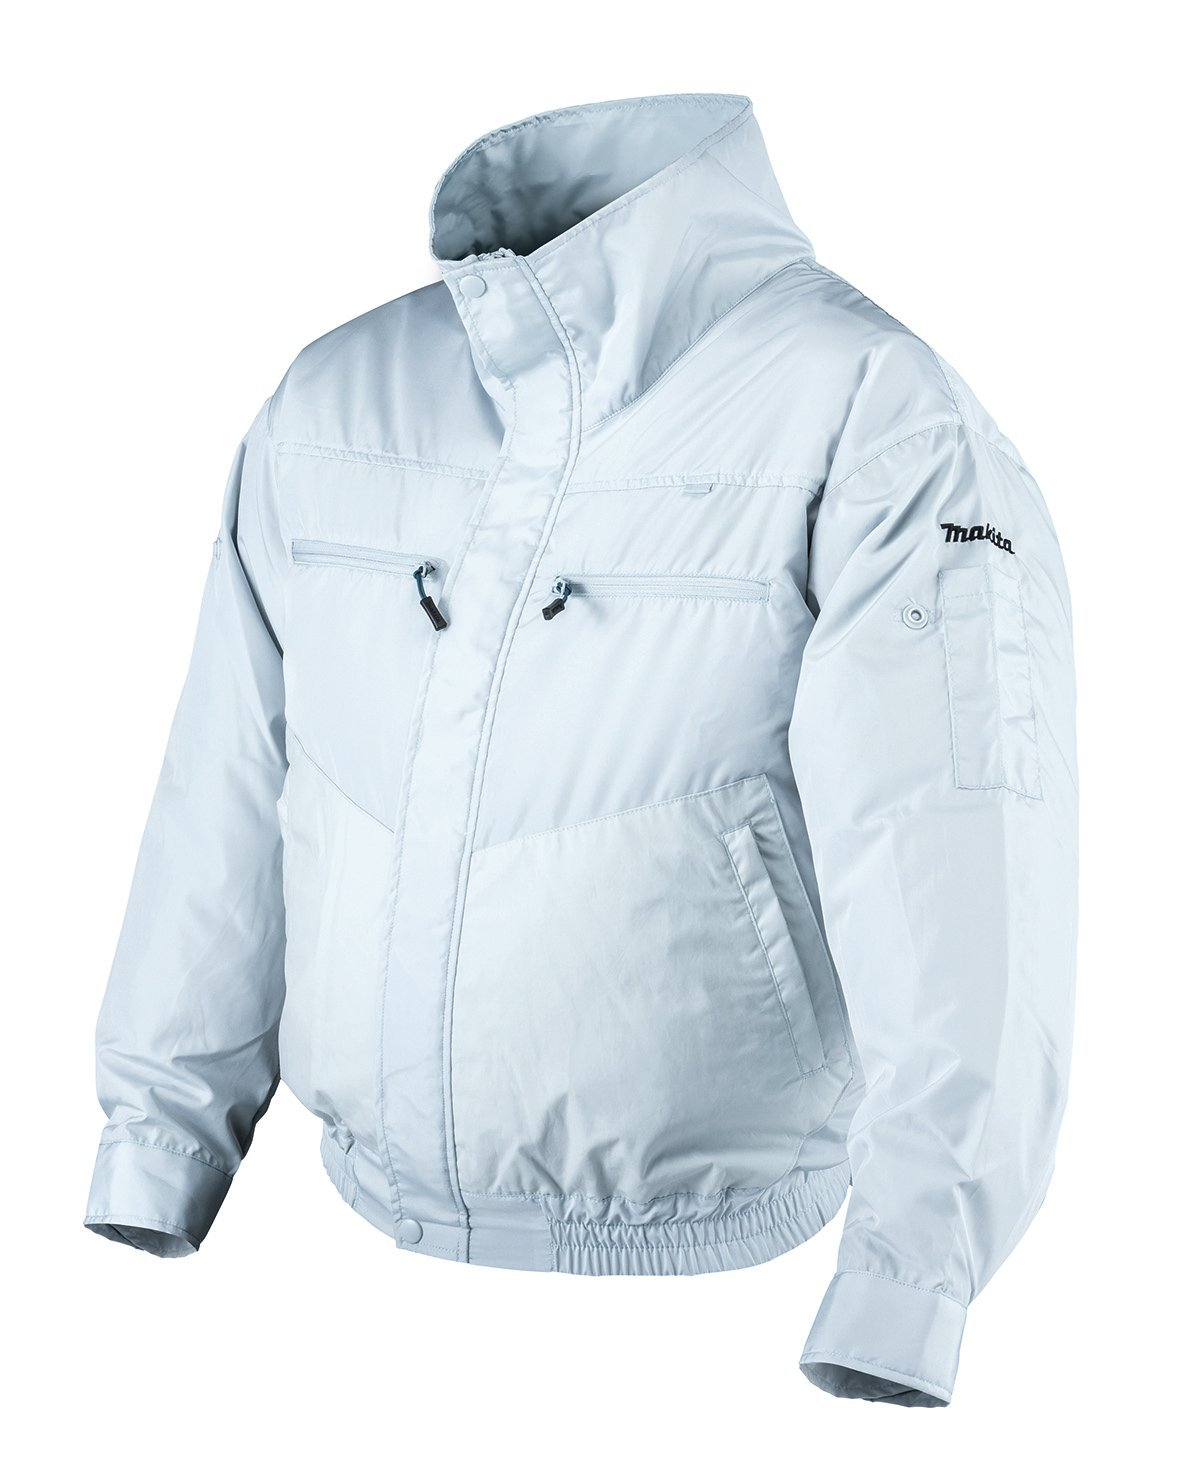 DEWBU 空調服 作業服 夏用 空調風神服 長袖 熱中症対策 エアークラフト ブルゾン ファン付 節電 B07BGXVBS3 XXX-Large|カモフラージュ